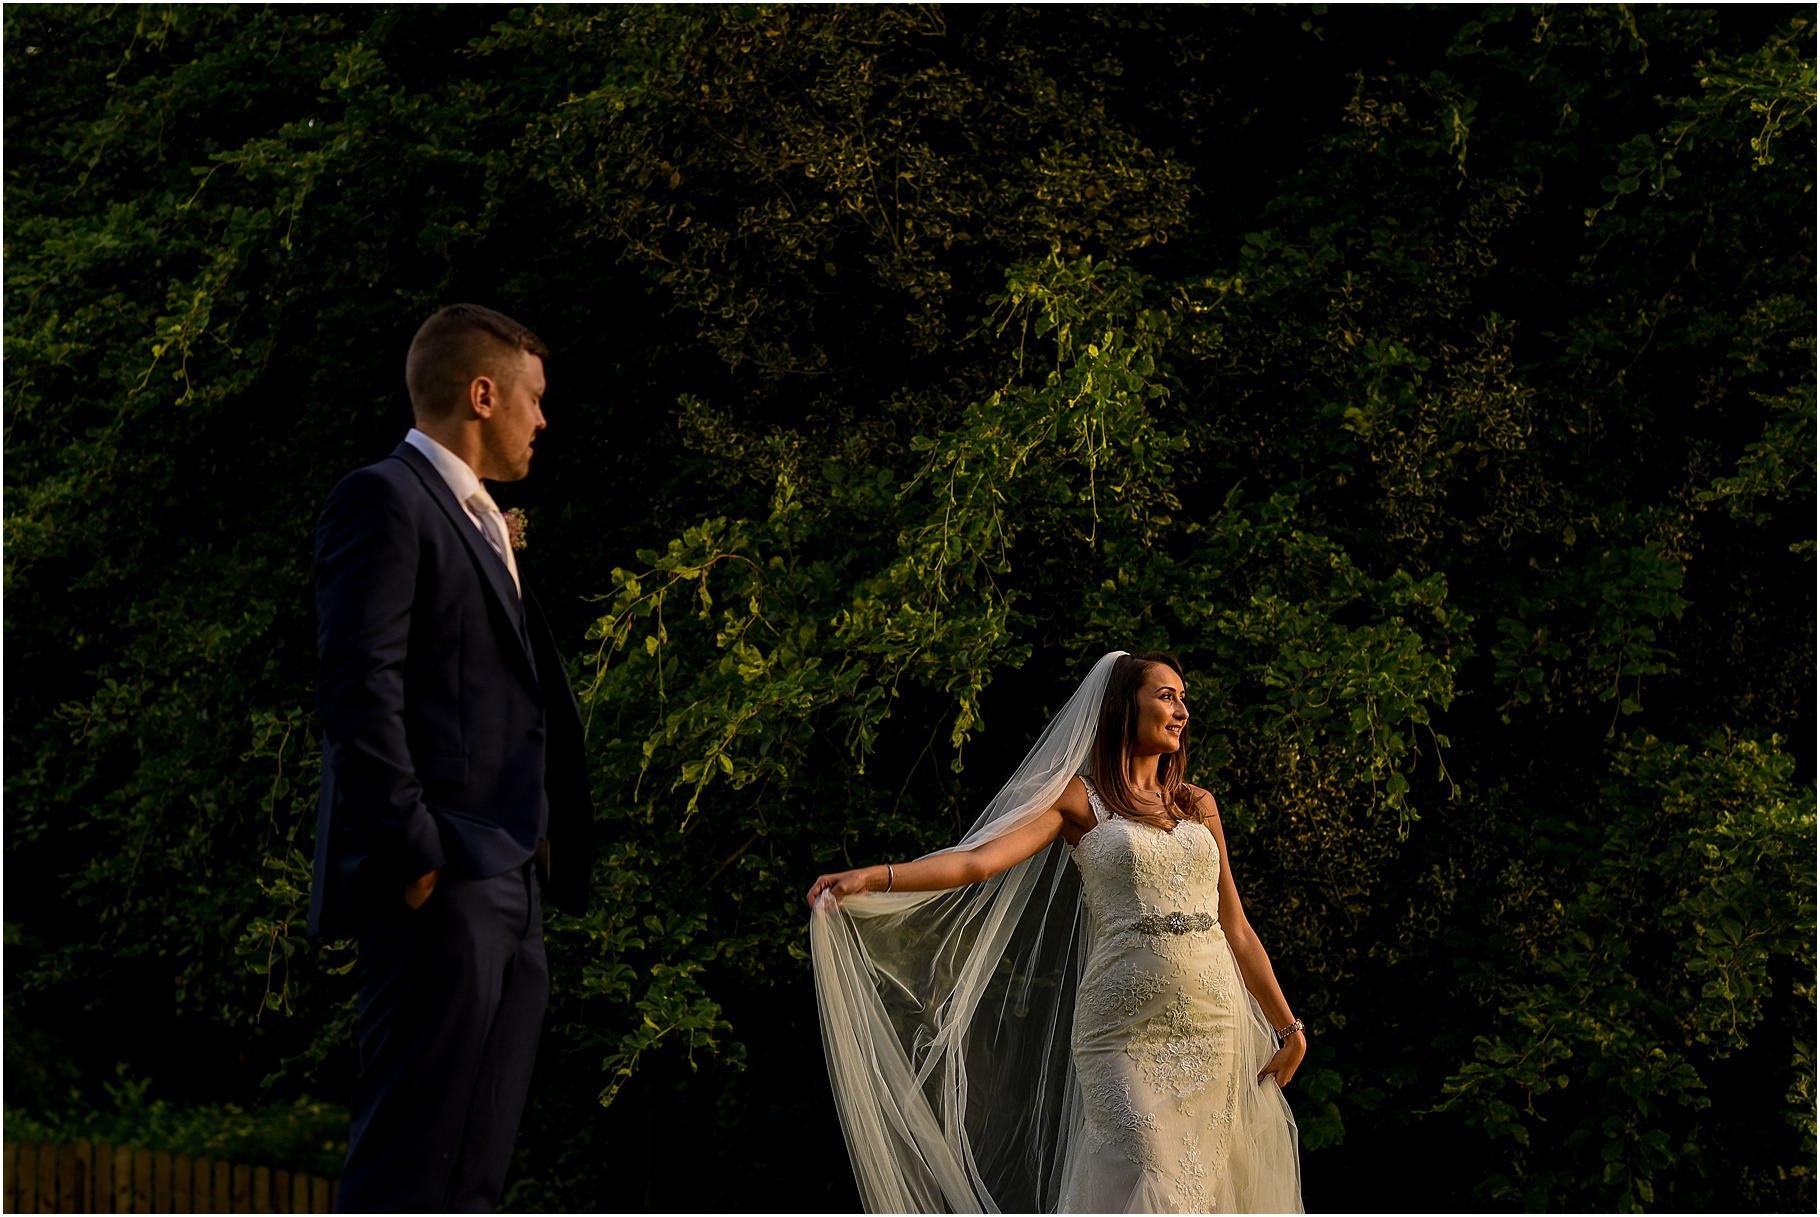 dan-wootton-photography-2017-weddings-083.jpg